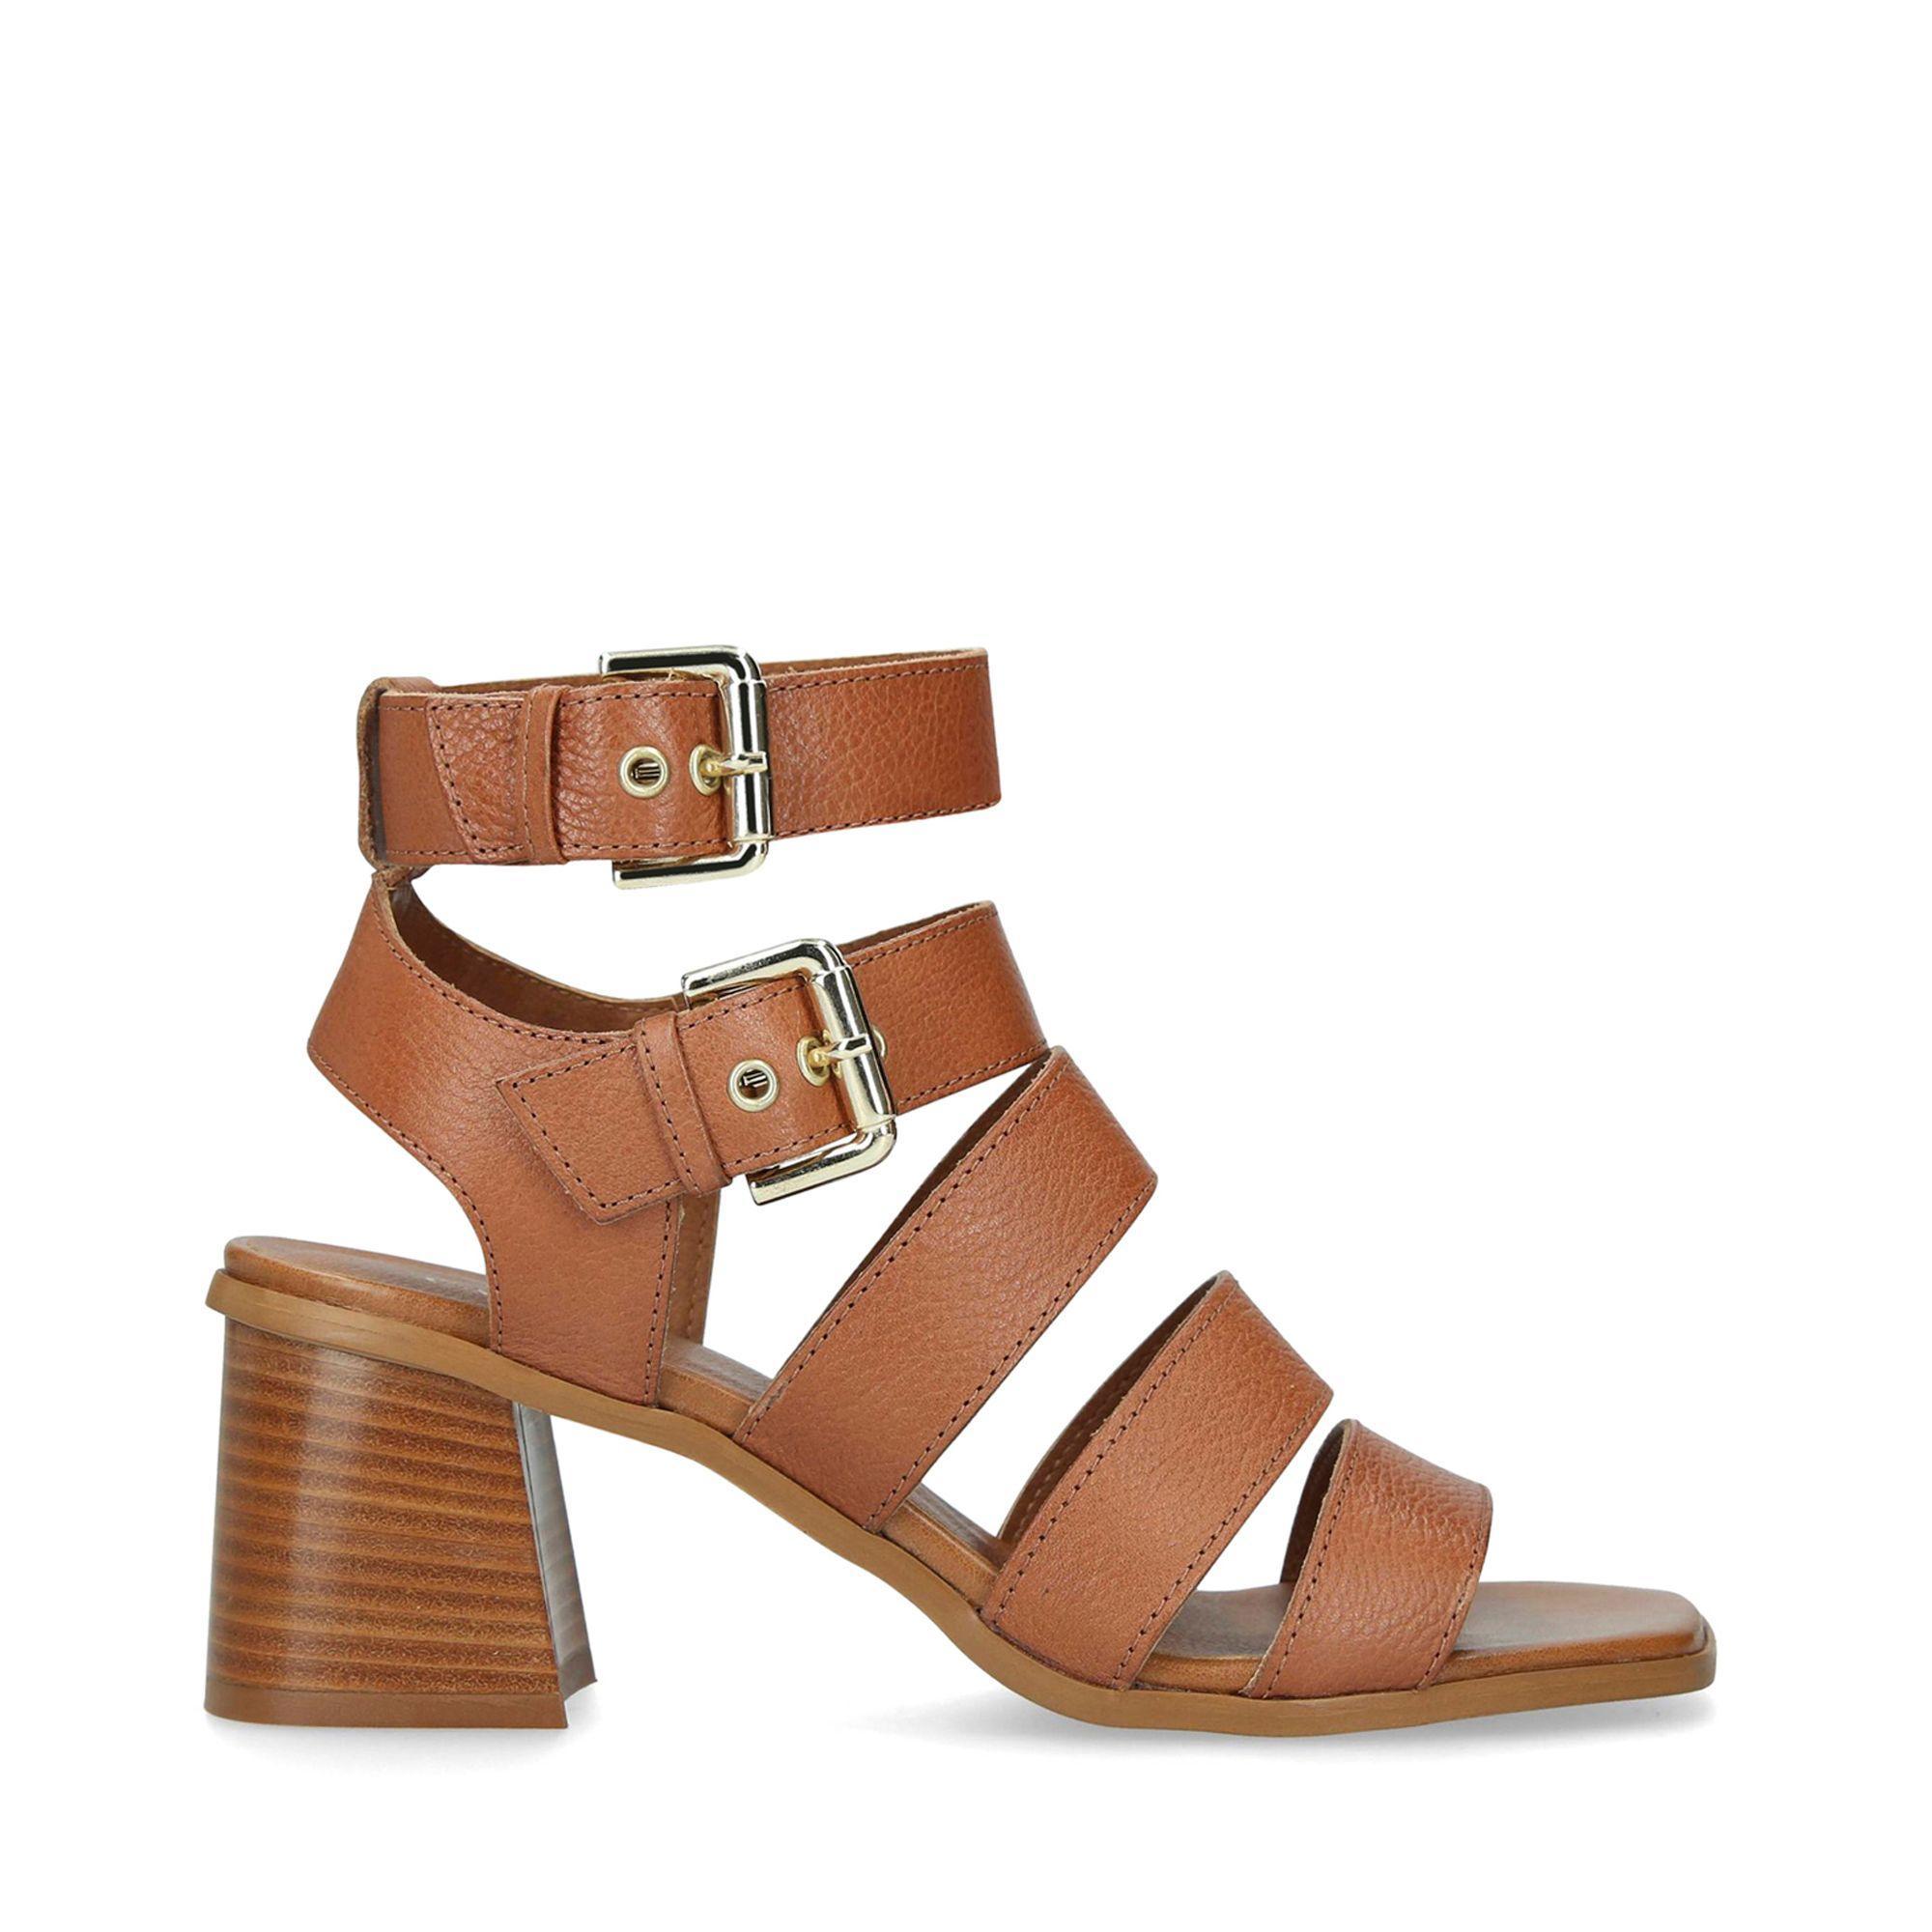 7f19bb4bf3 Carvela Kurt Geiger Astute Leather Heeled Sandals in Brown - Lyst